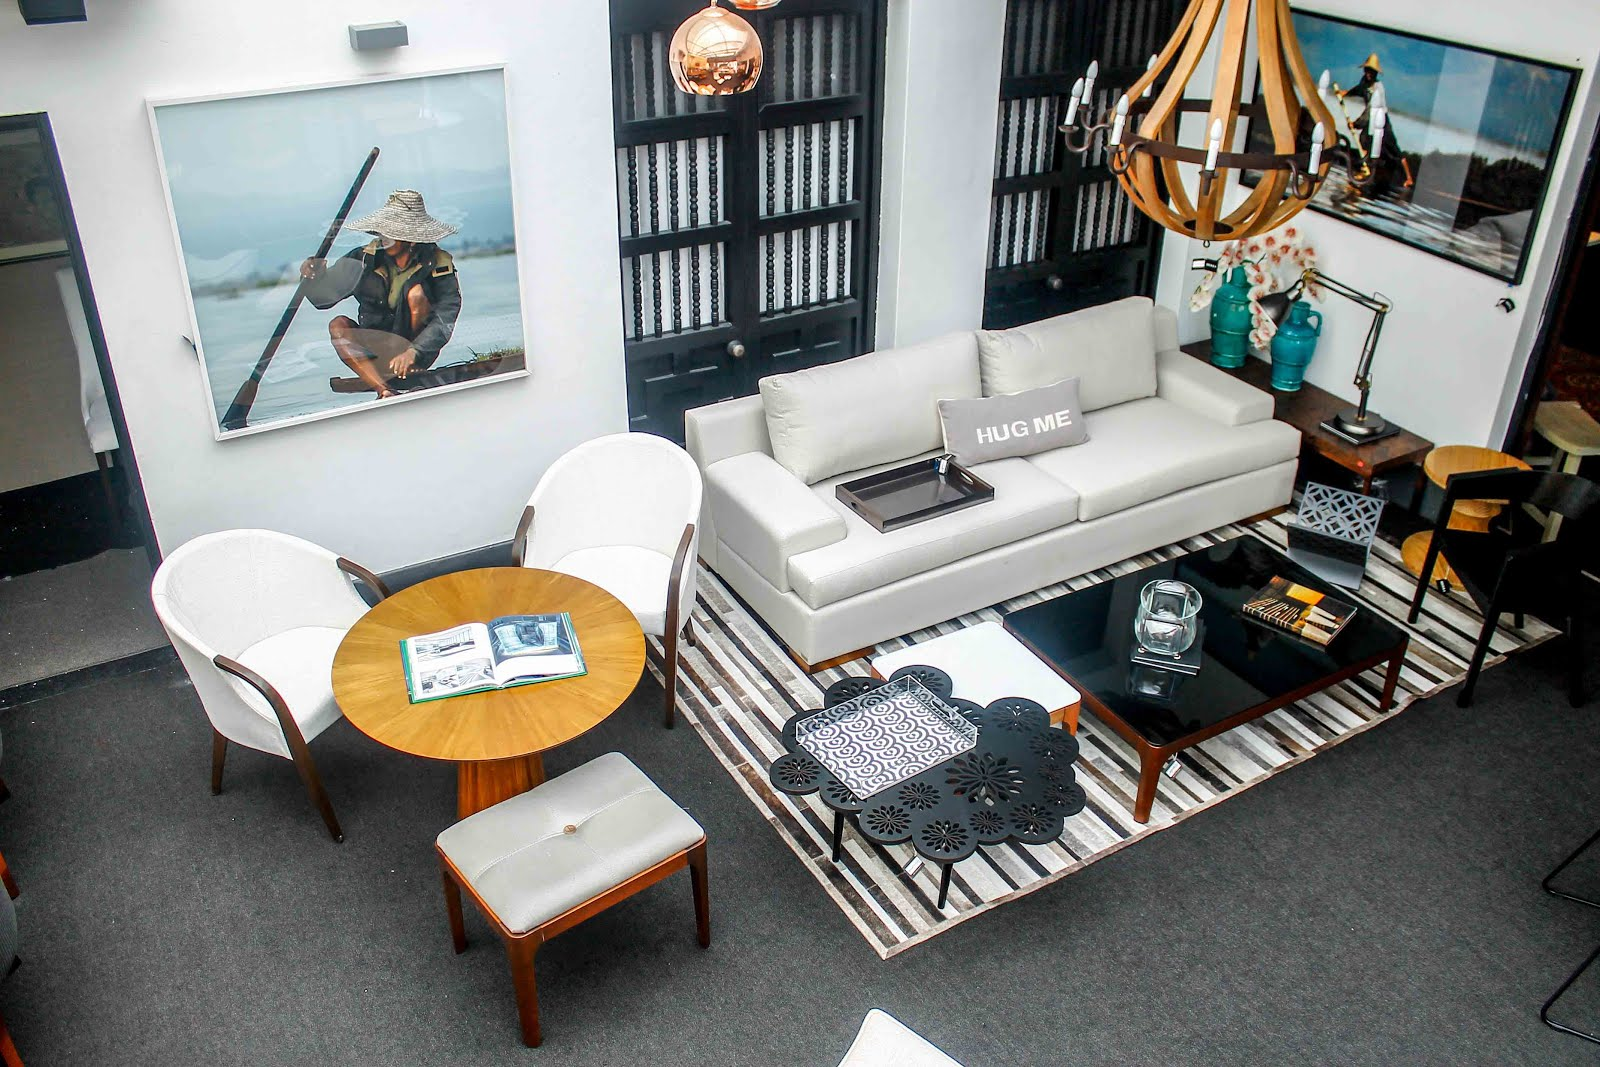 Lainteriorista sierra muebles dise o y calidad for Muebles calidad